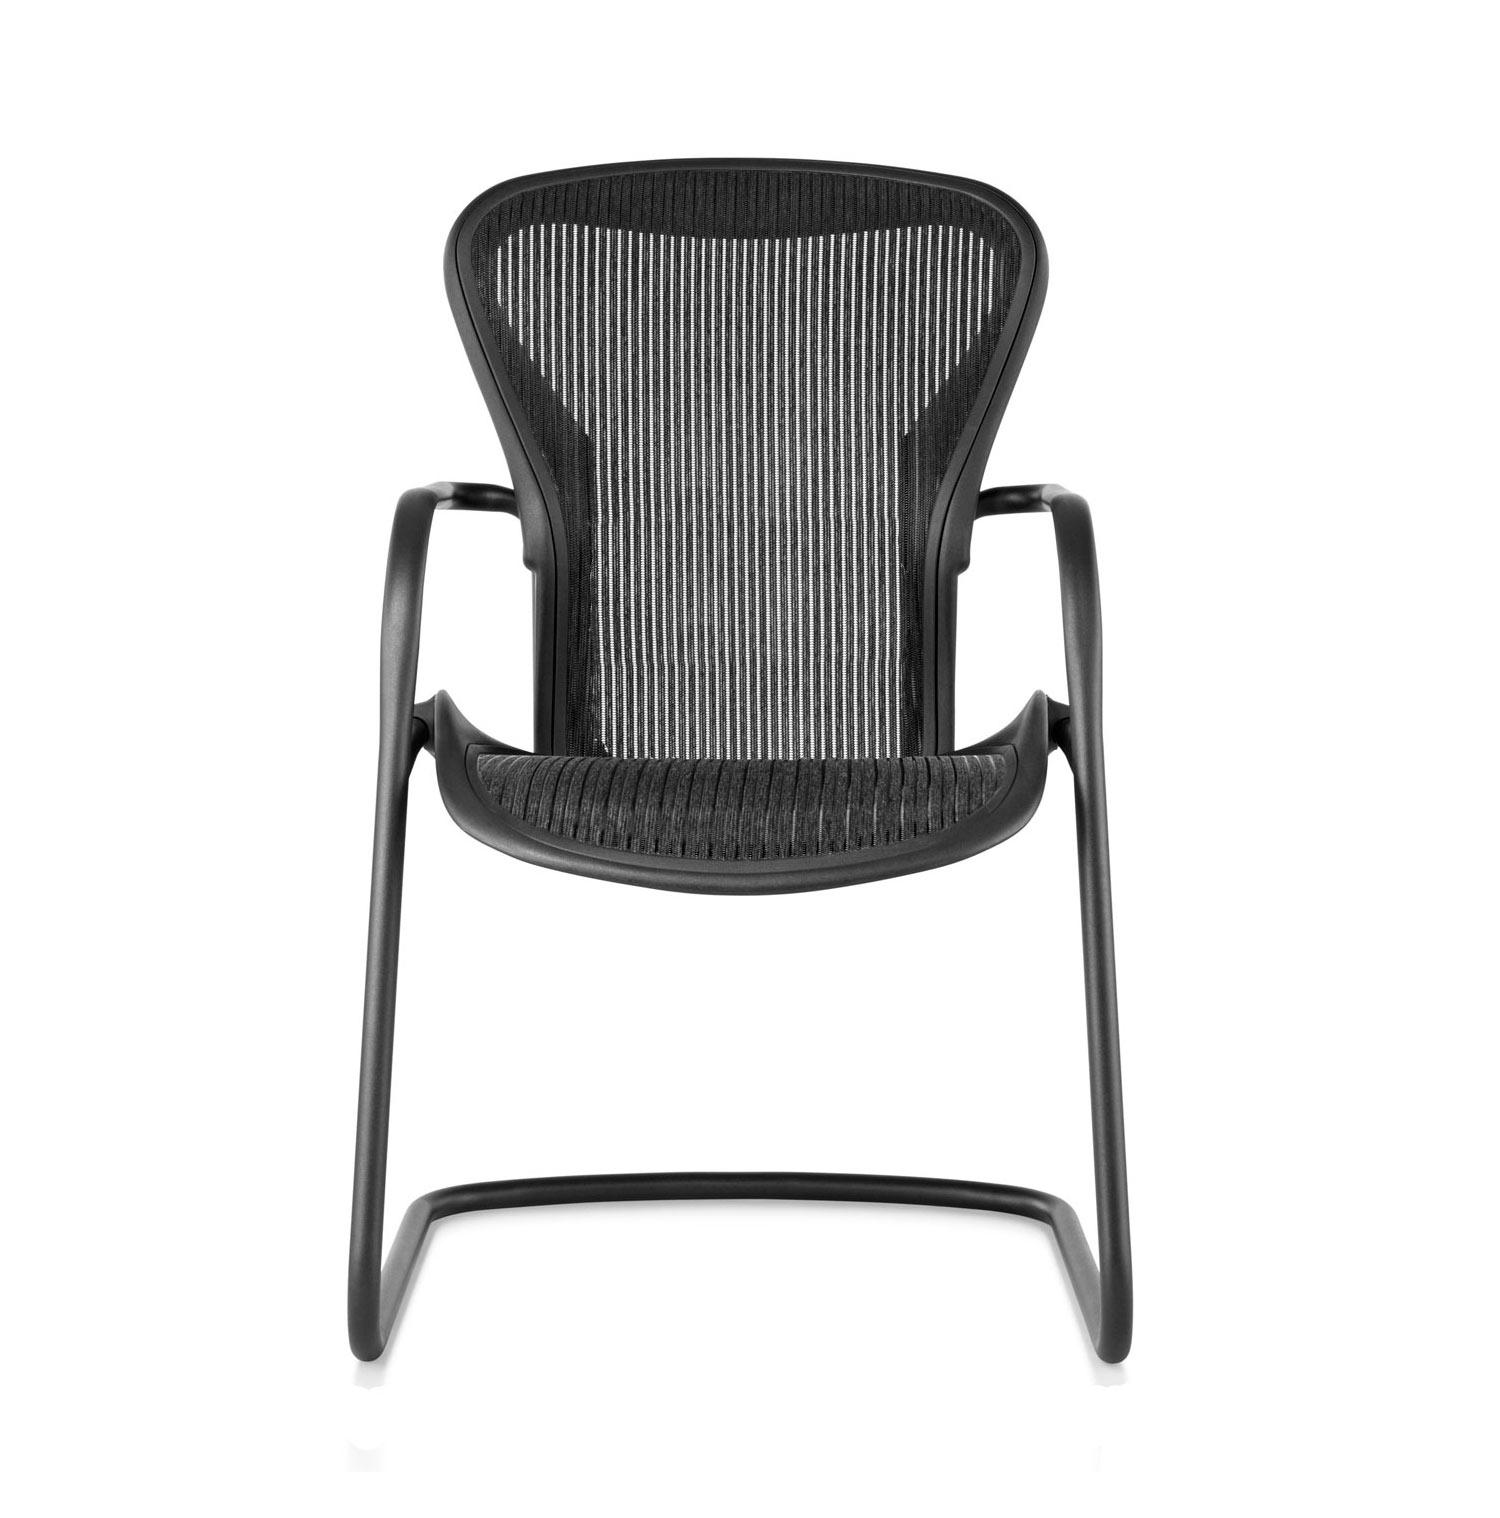 herman miller aeron besucherstuhl aeron chair. Black Bedroom Furniture Sets. Home Design Ideas